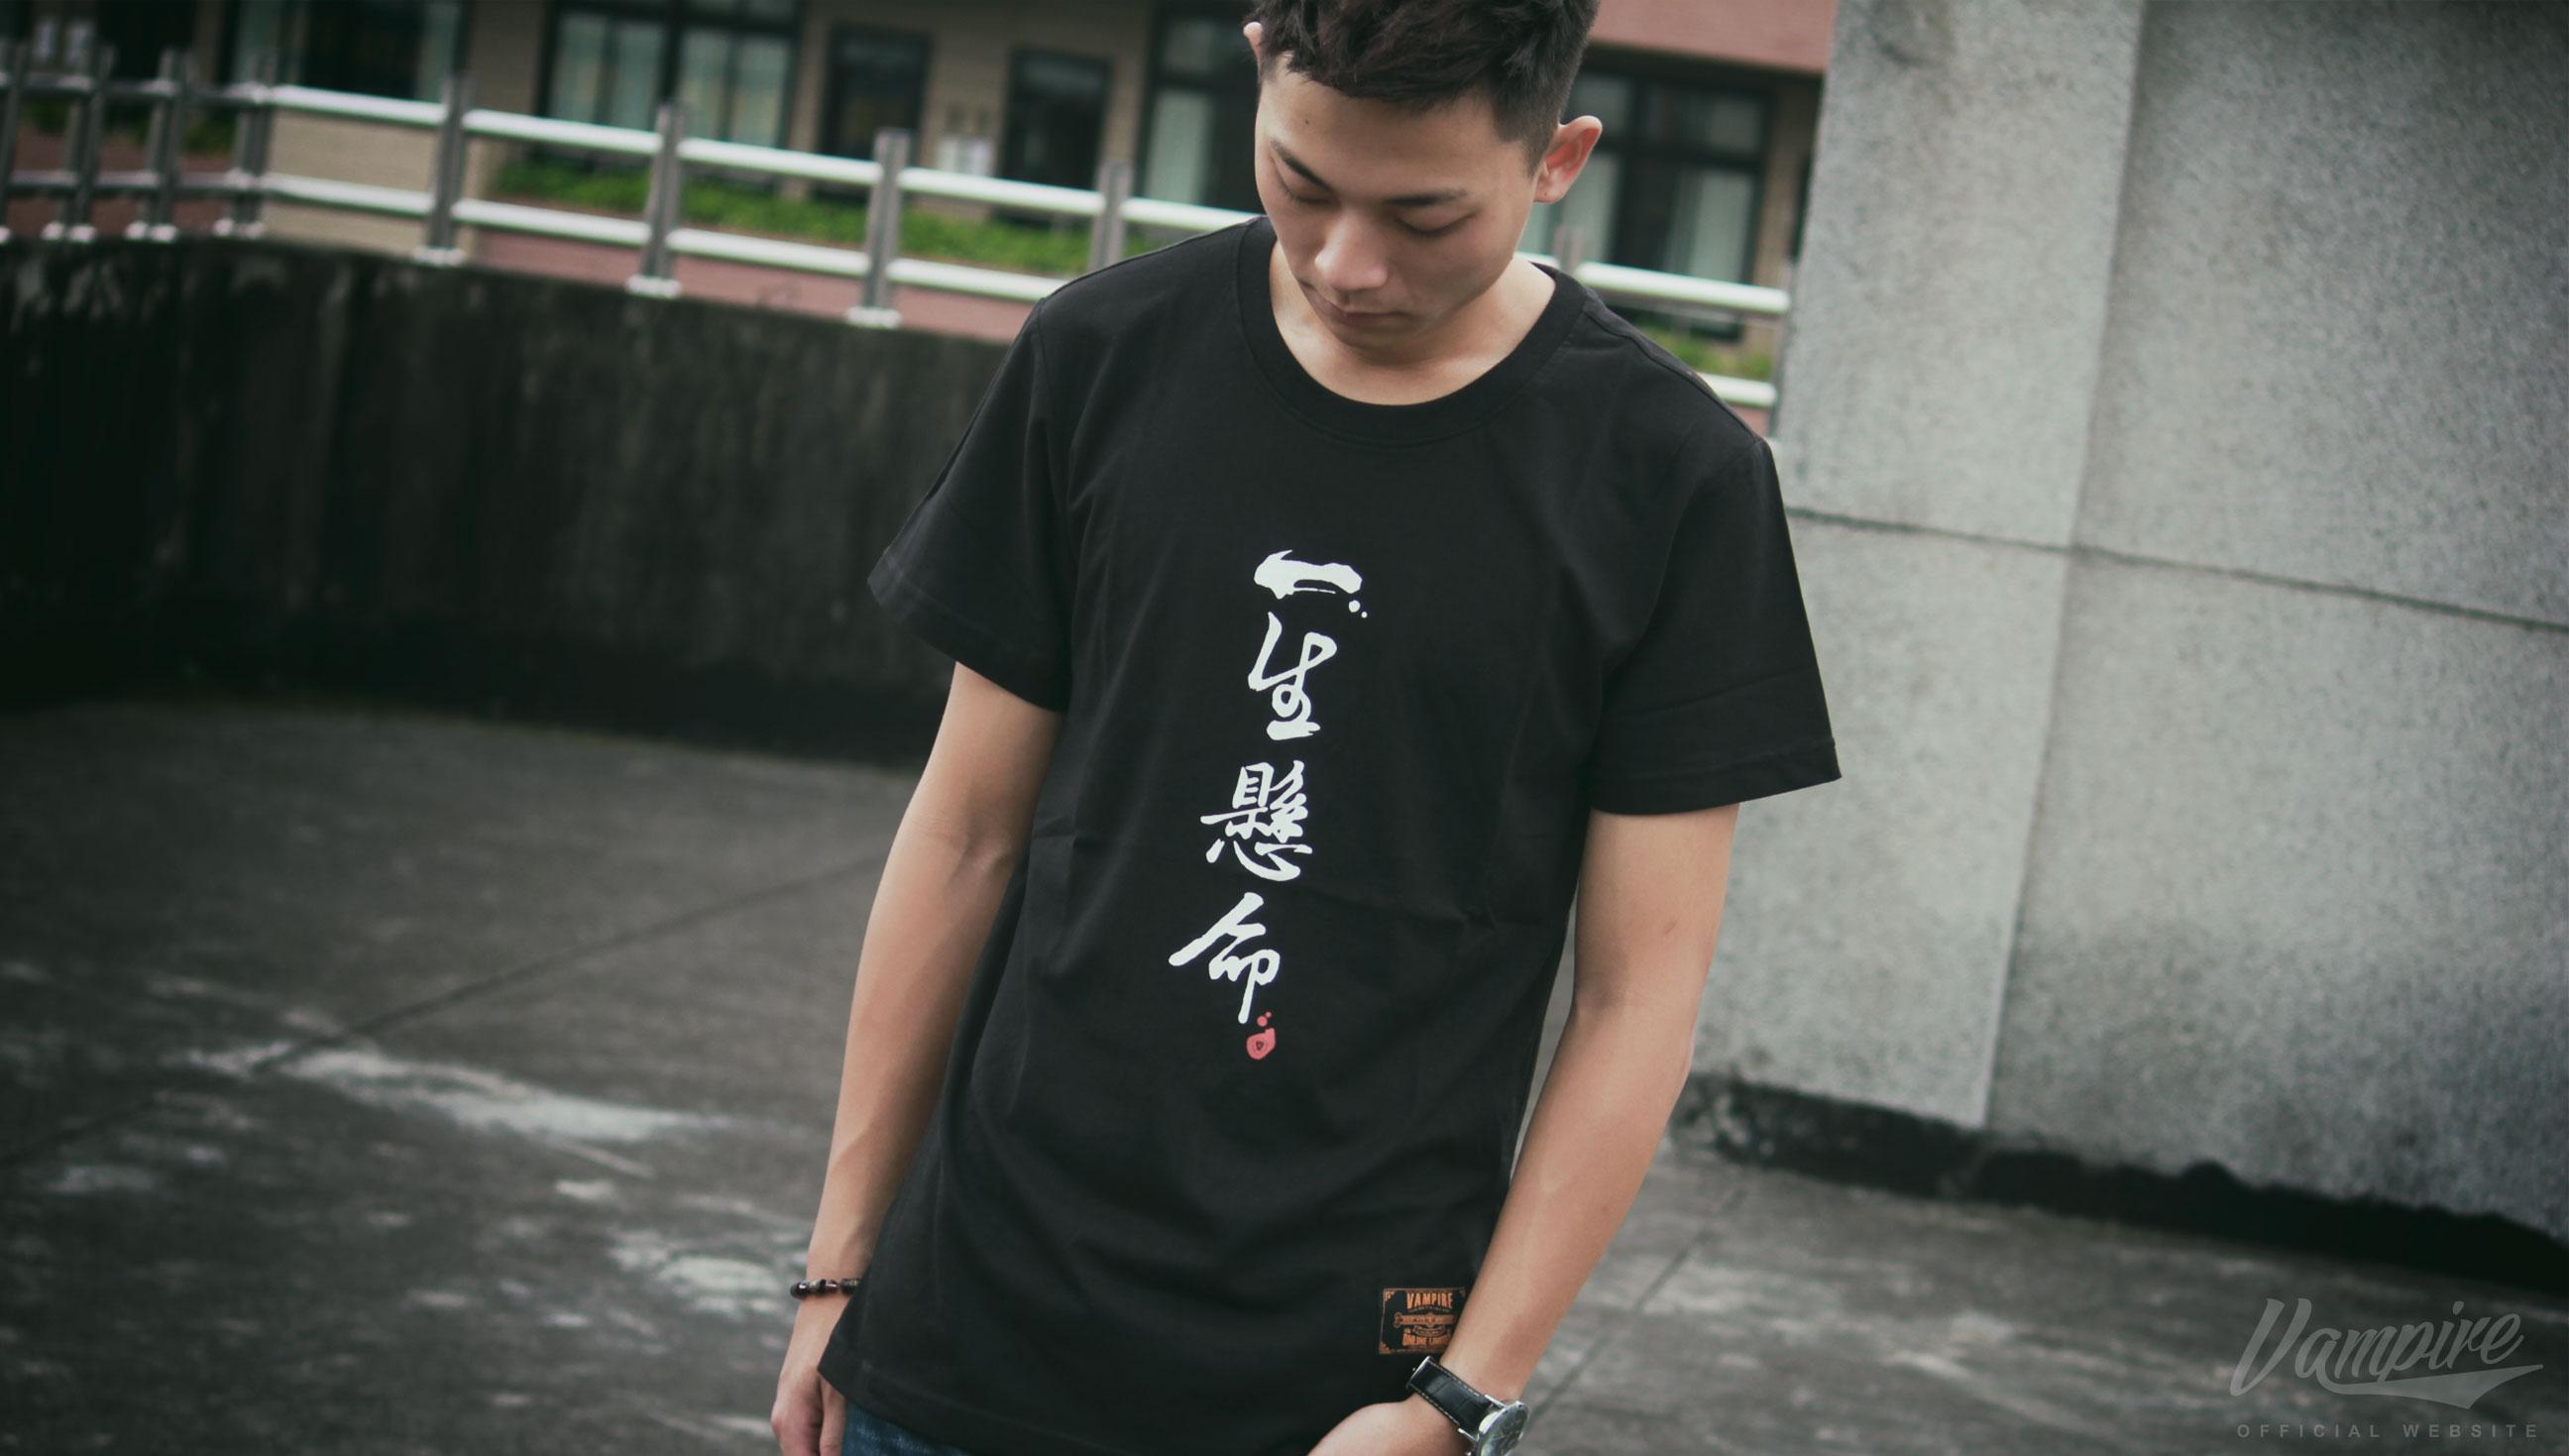 『 FREED ONLINE SHOP 』15 S S 「一生懸命」中文字復刻短TEE 黑底白字